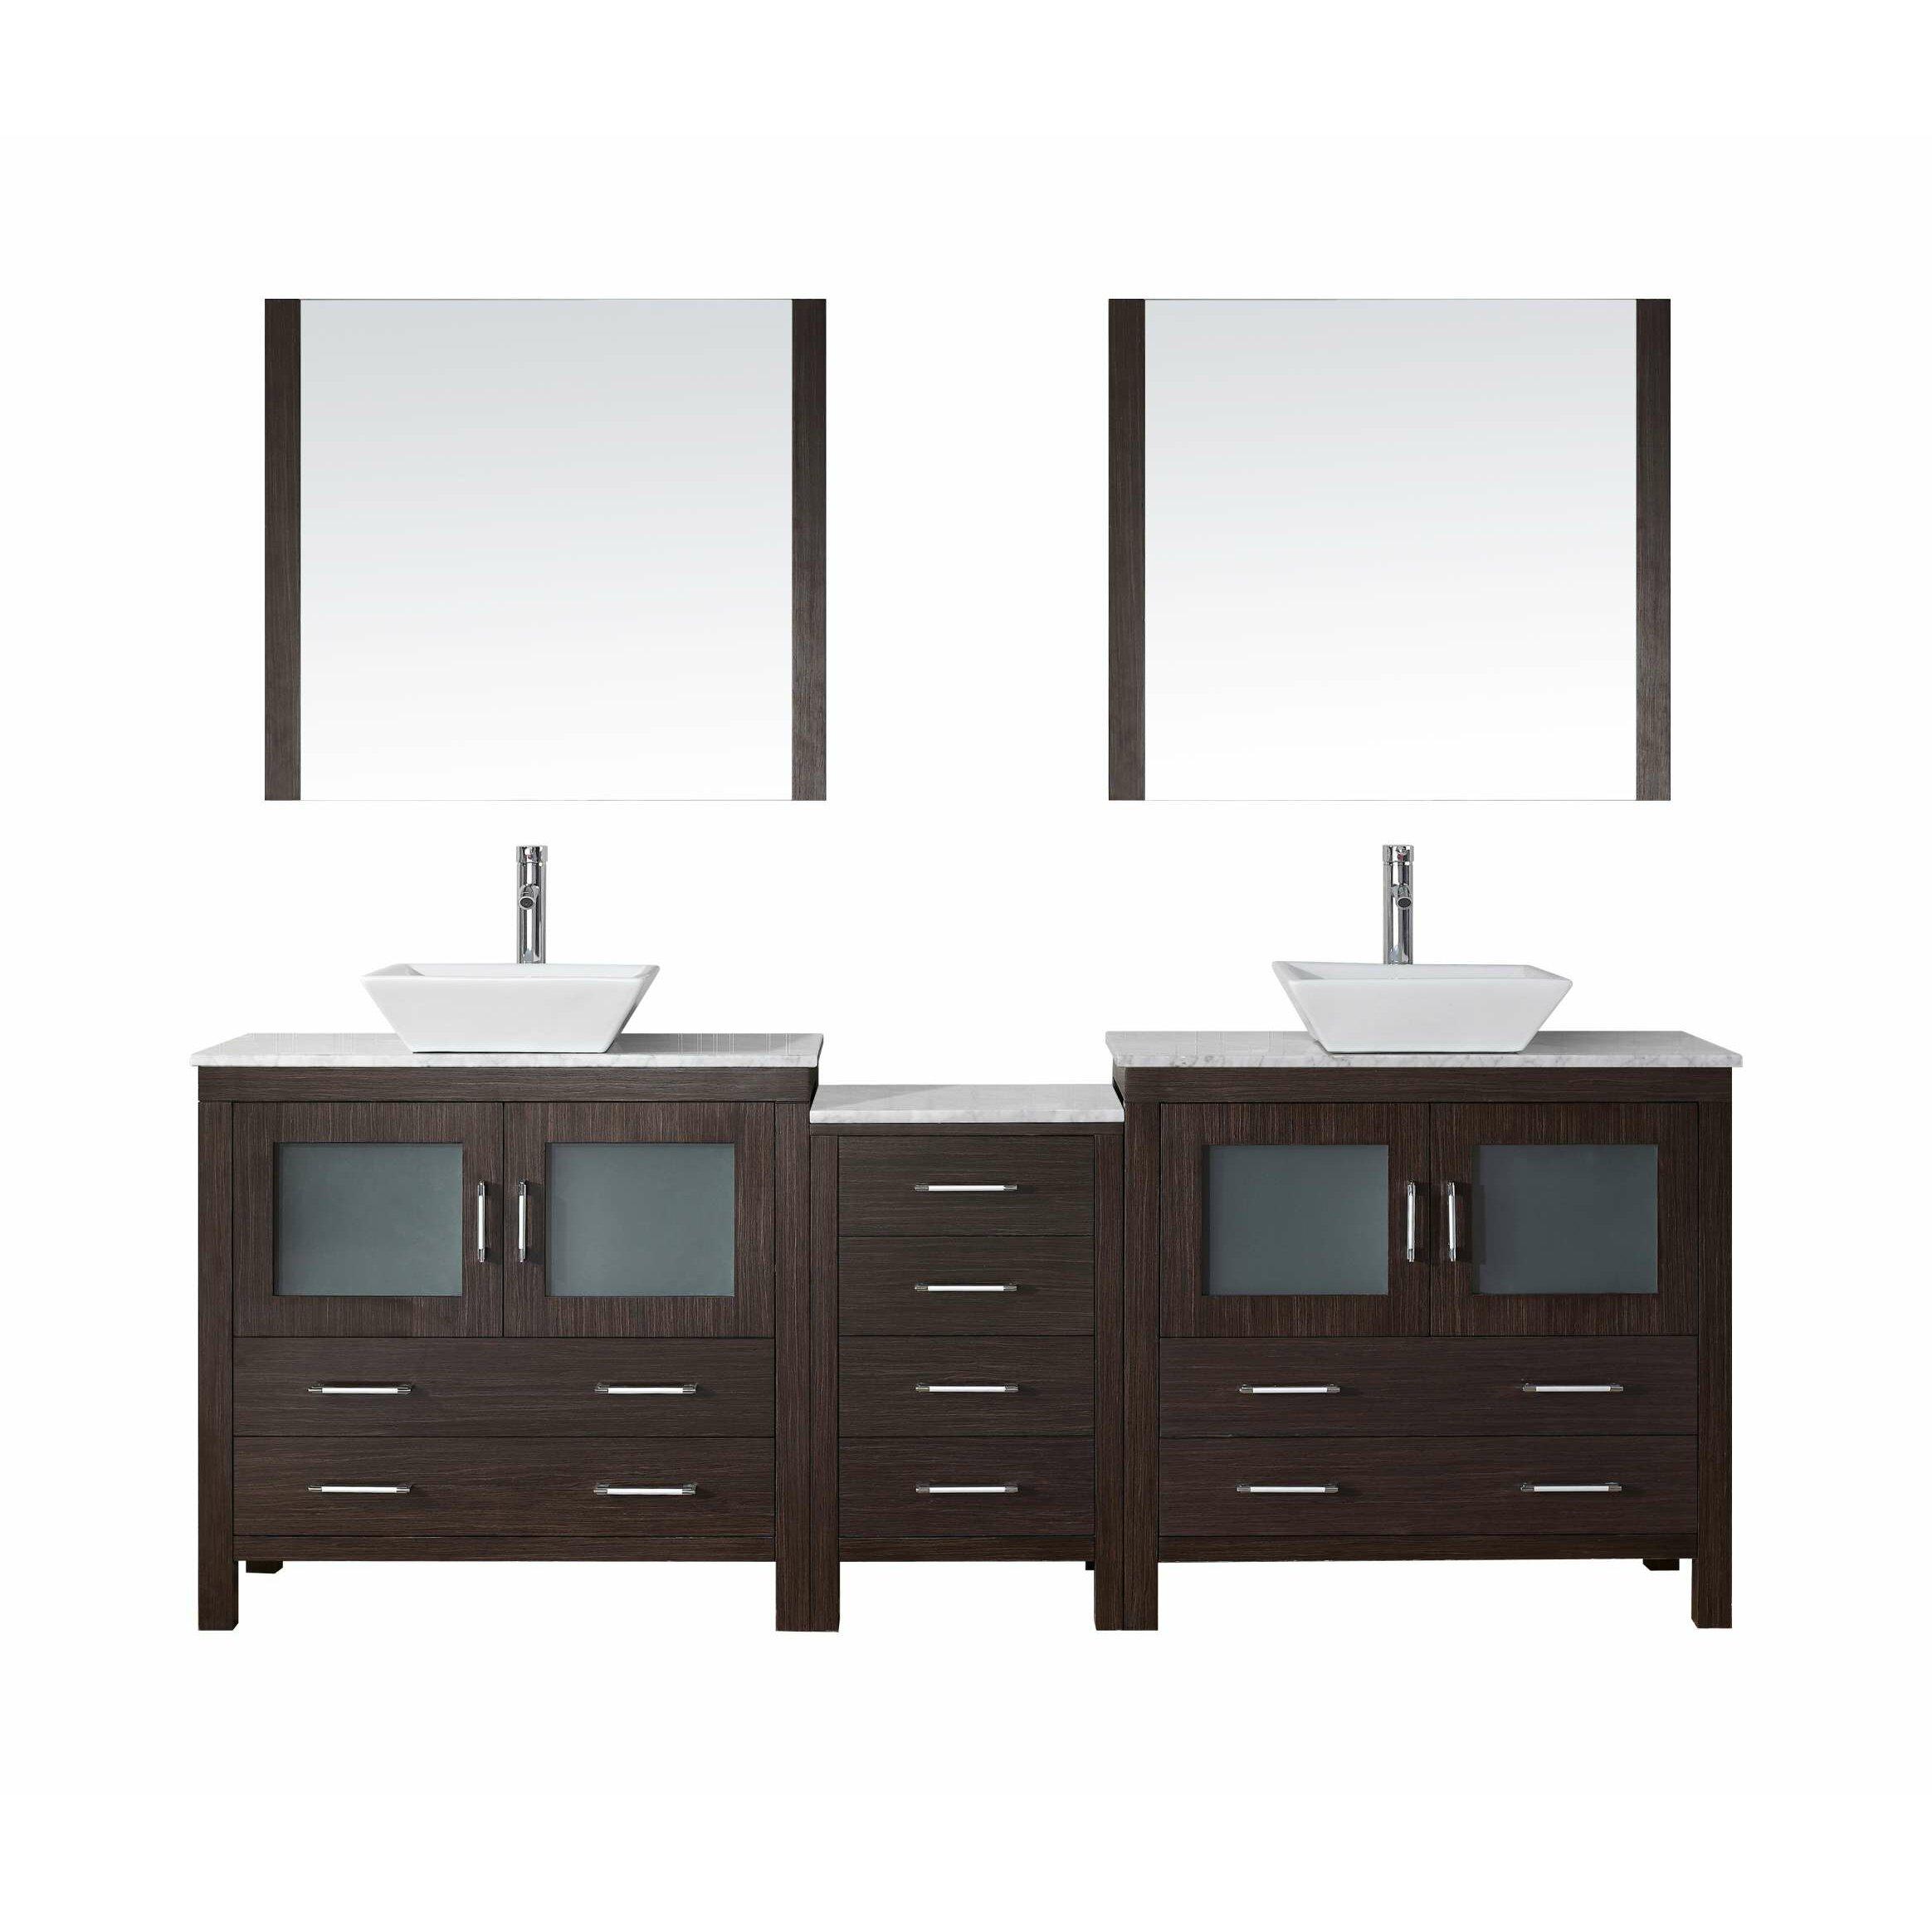 Virtu Dior 91 Double Bathroom Vanity Set With Mirror